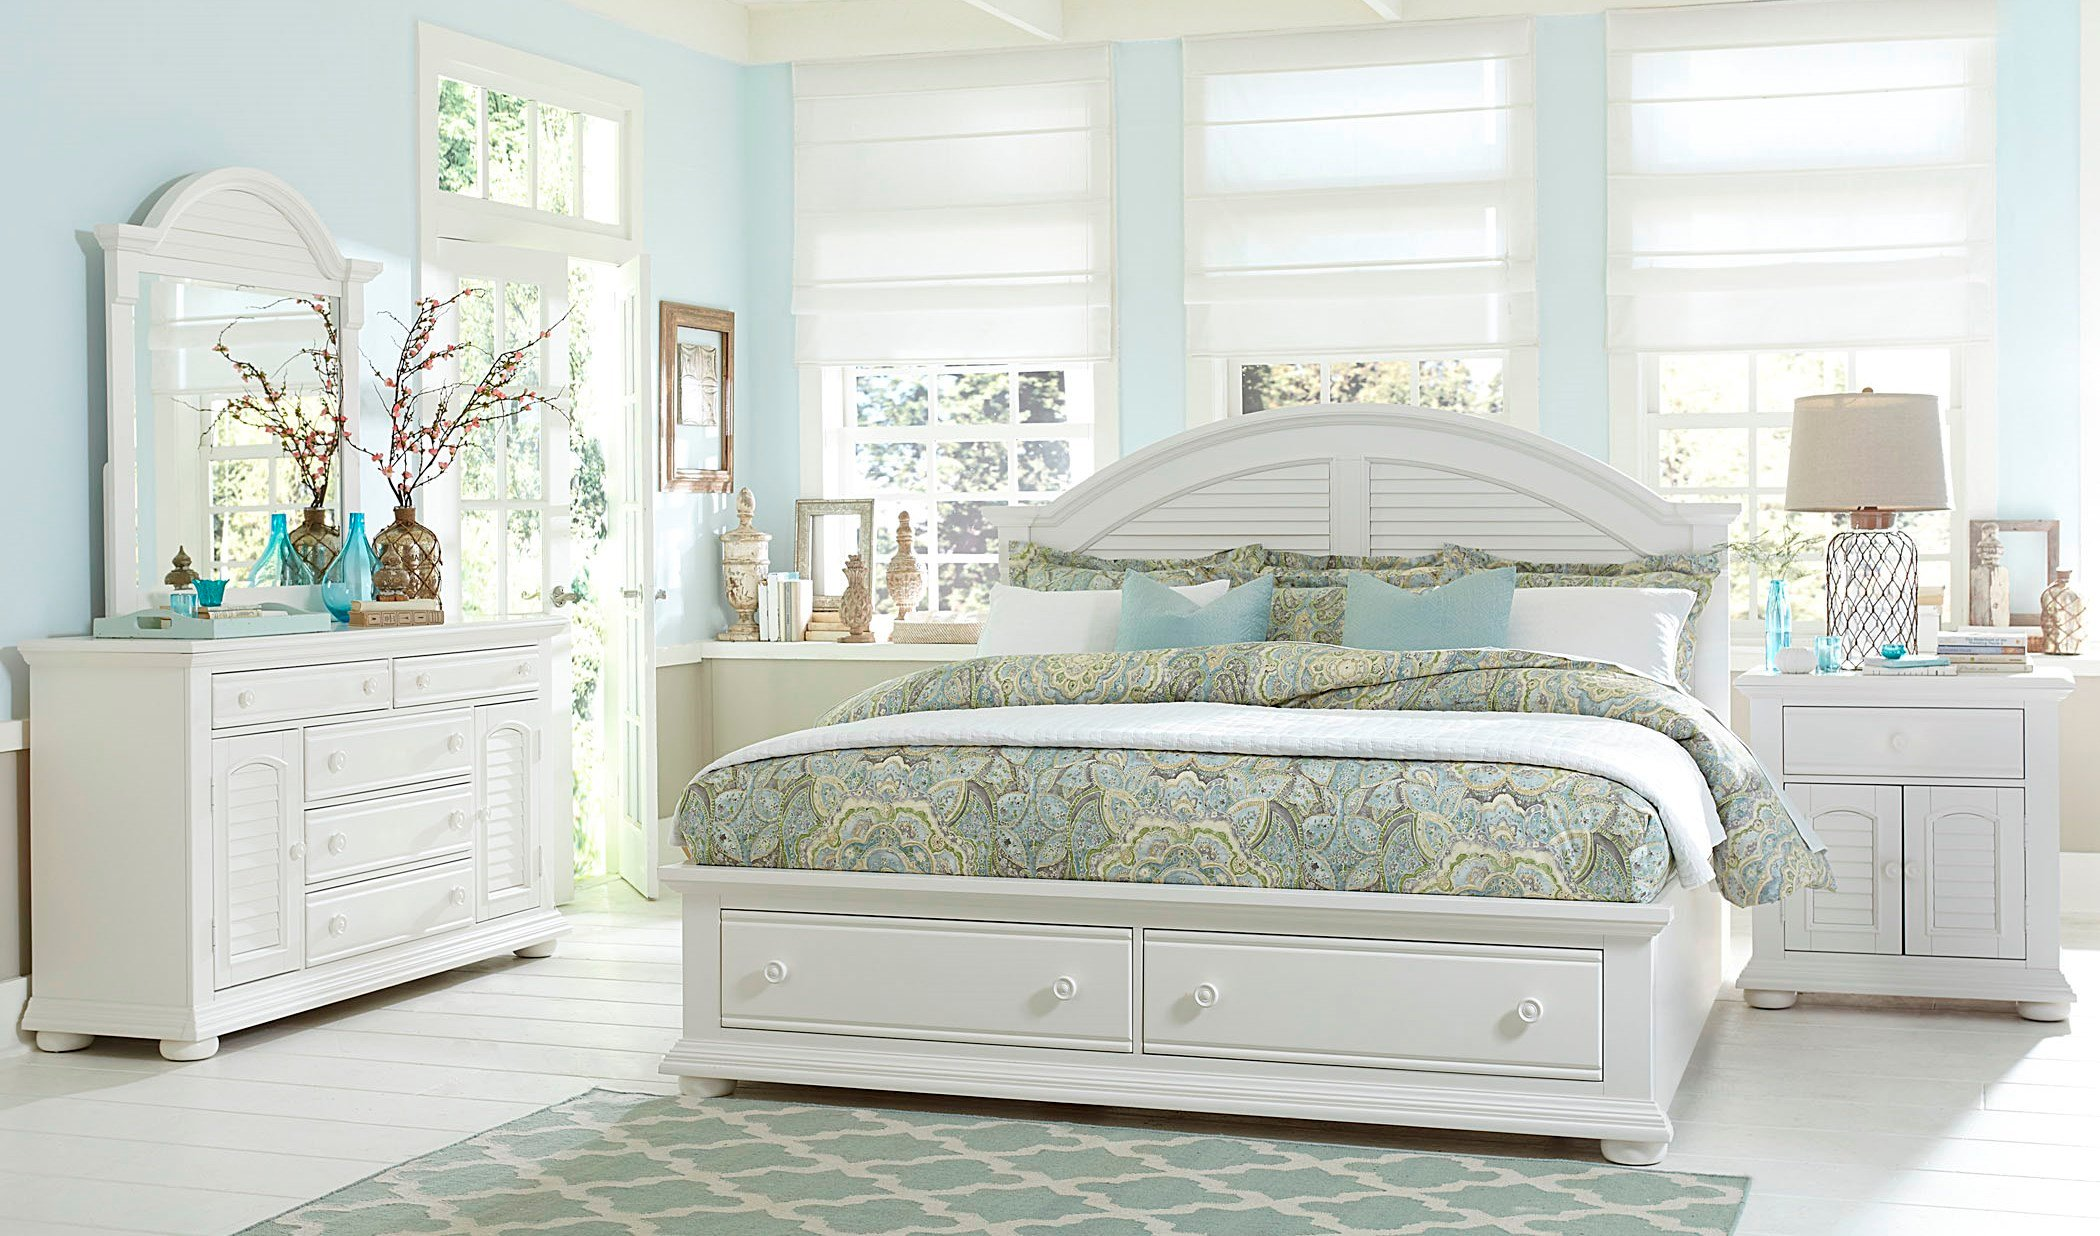 Summer House Oyster White Panel Storage Bedroom SetMedia Image